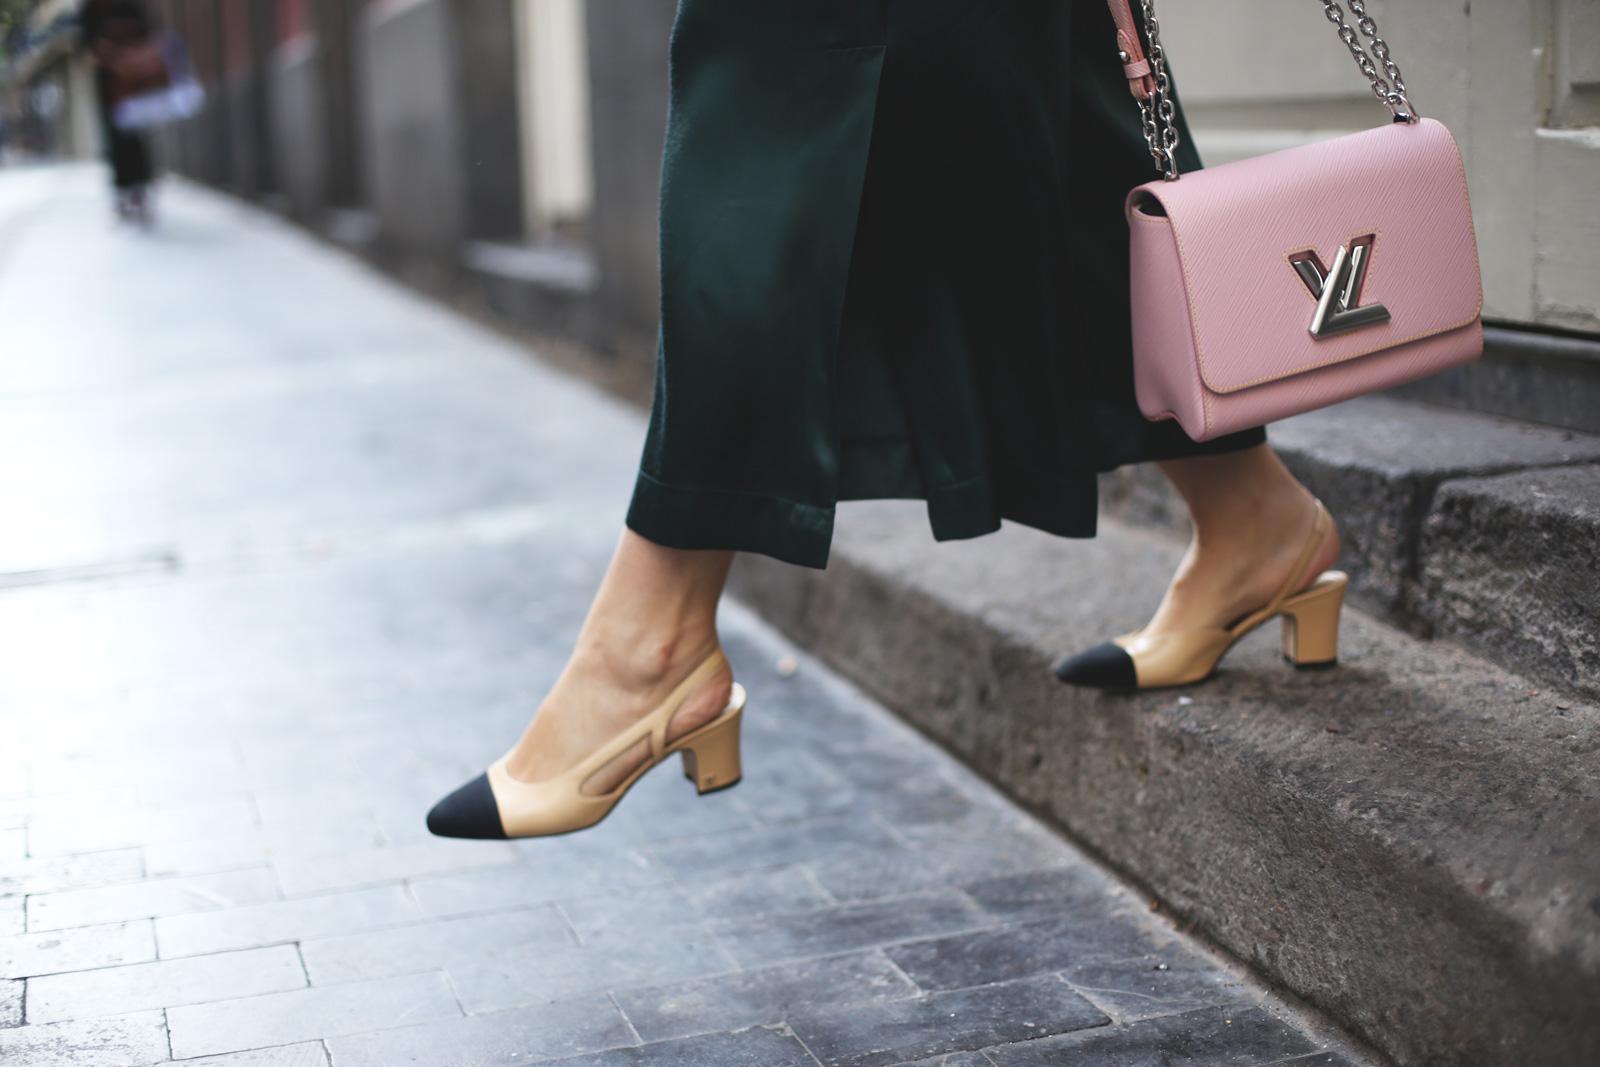 zapatos de chanel en mi blog de moda